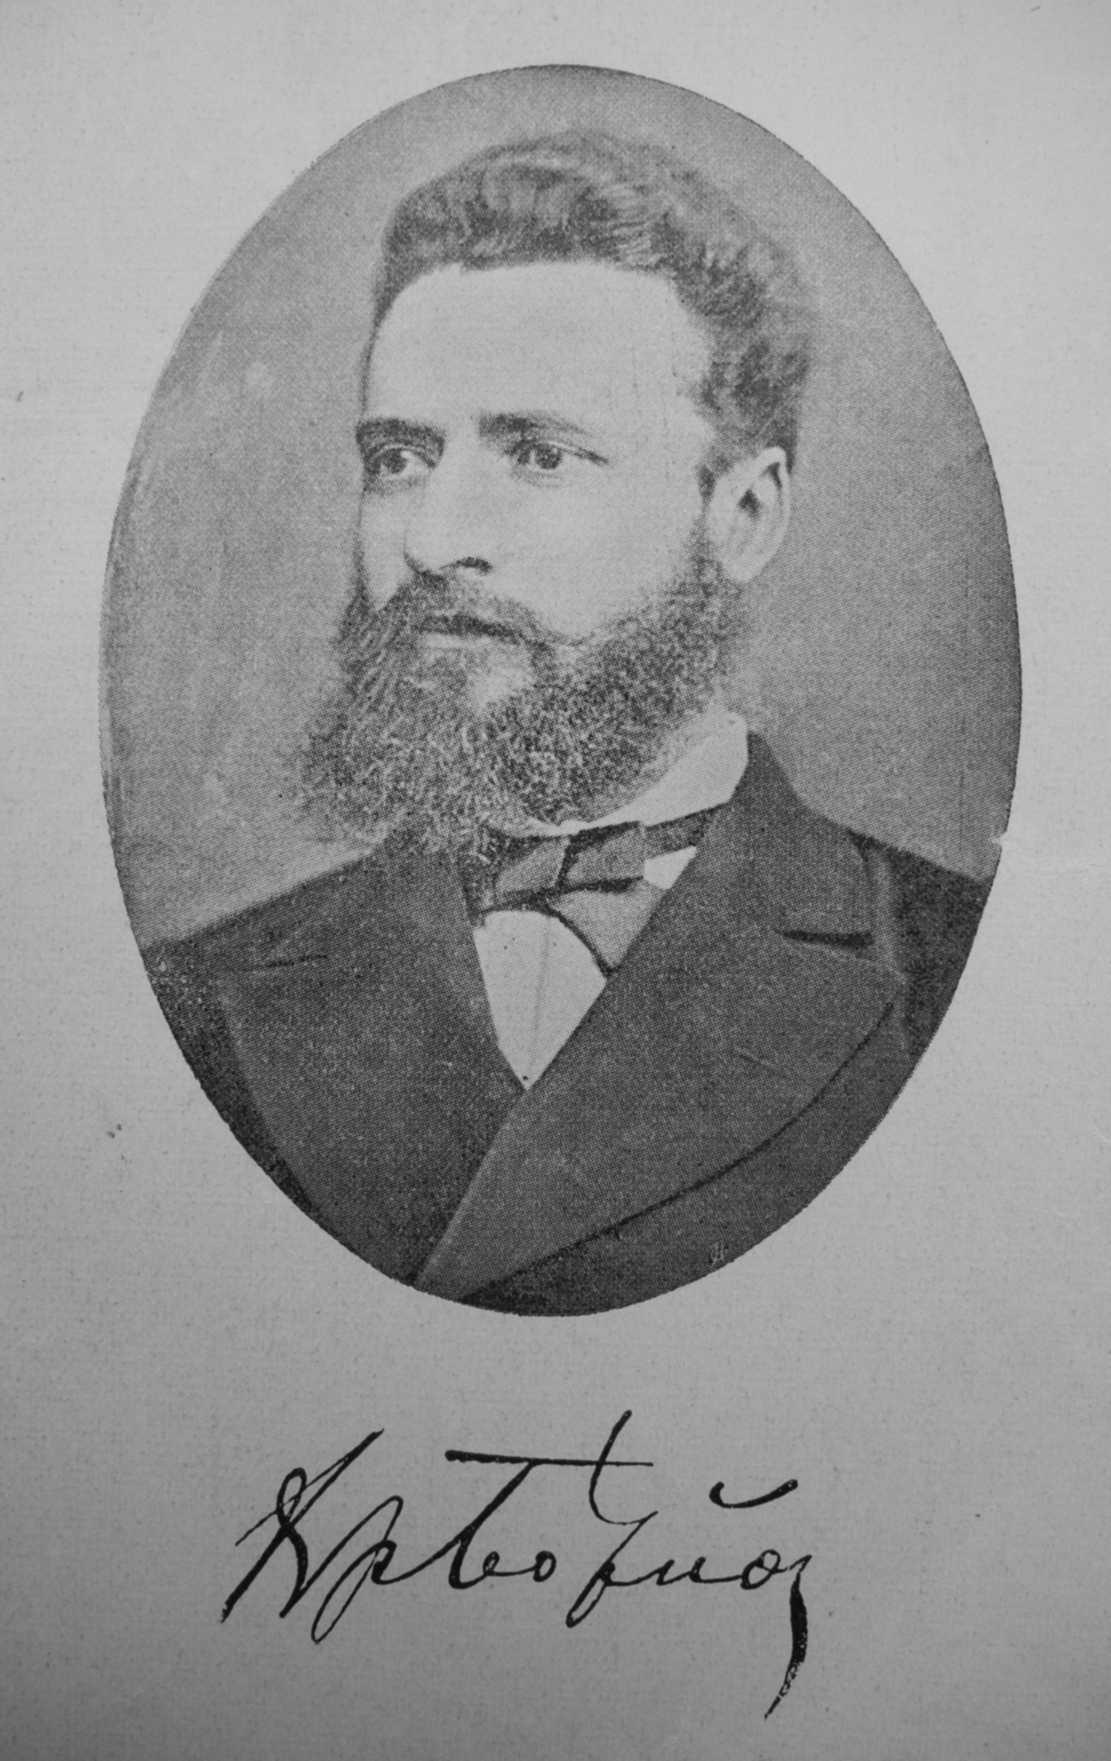 Hristo Botev, i la seva signatura, fotografiat per Toma Hitrov (Bucarest, maig de 1875)